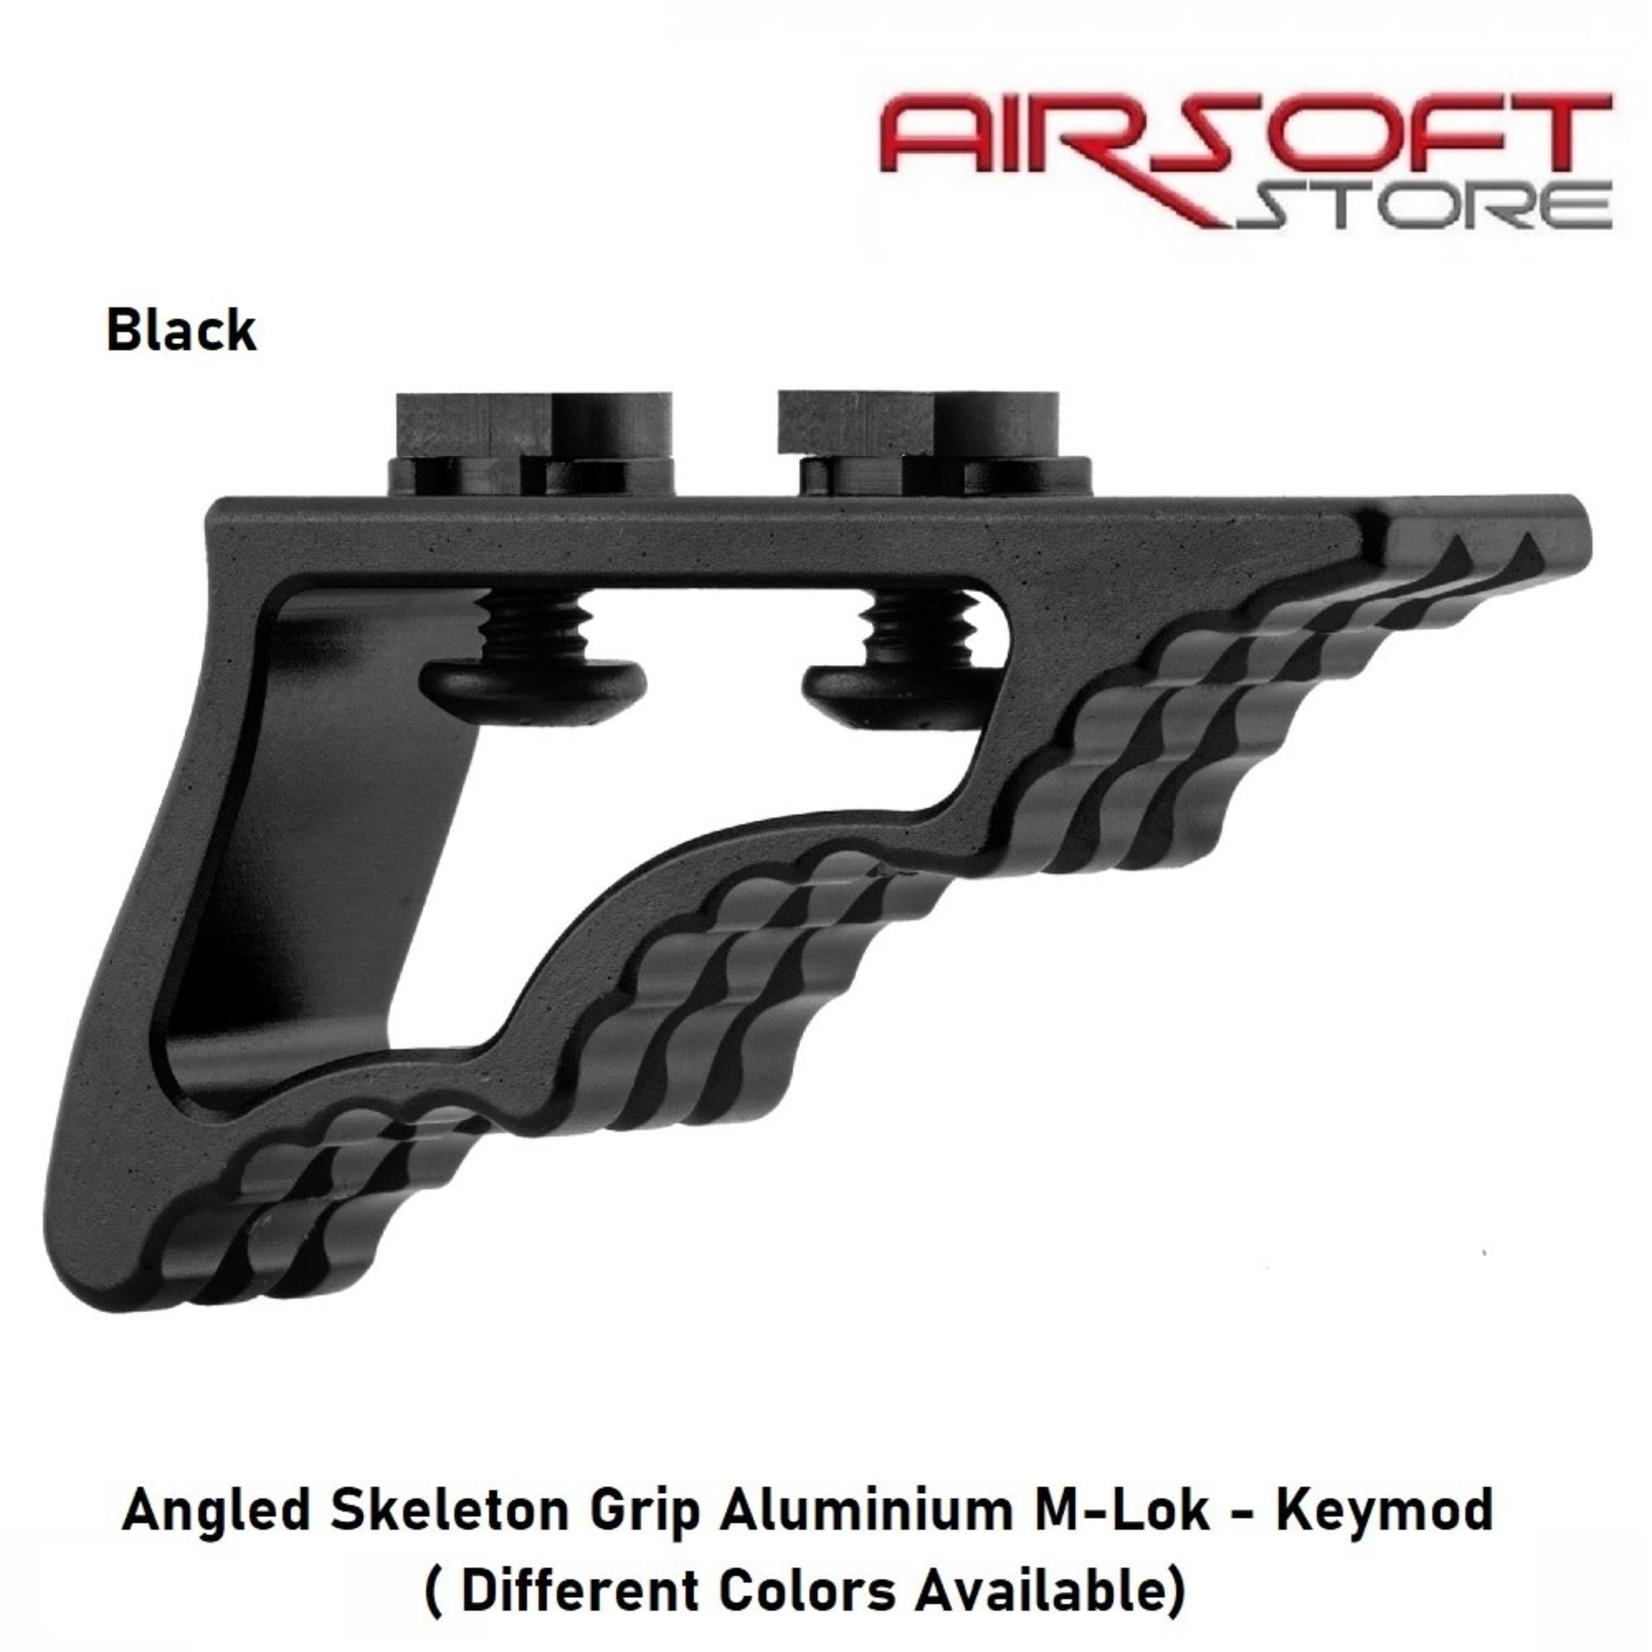 Angled Skeleton Grip Aluminium M-Lok - Keymod